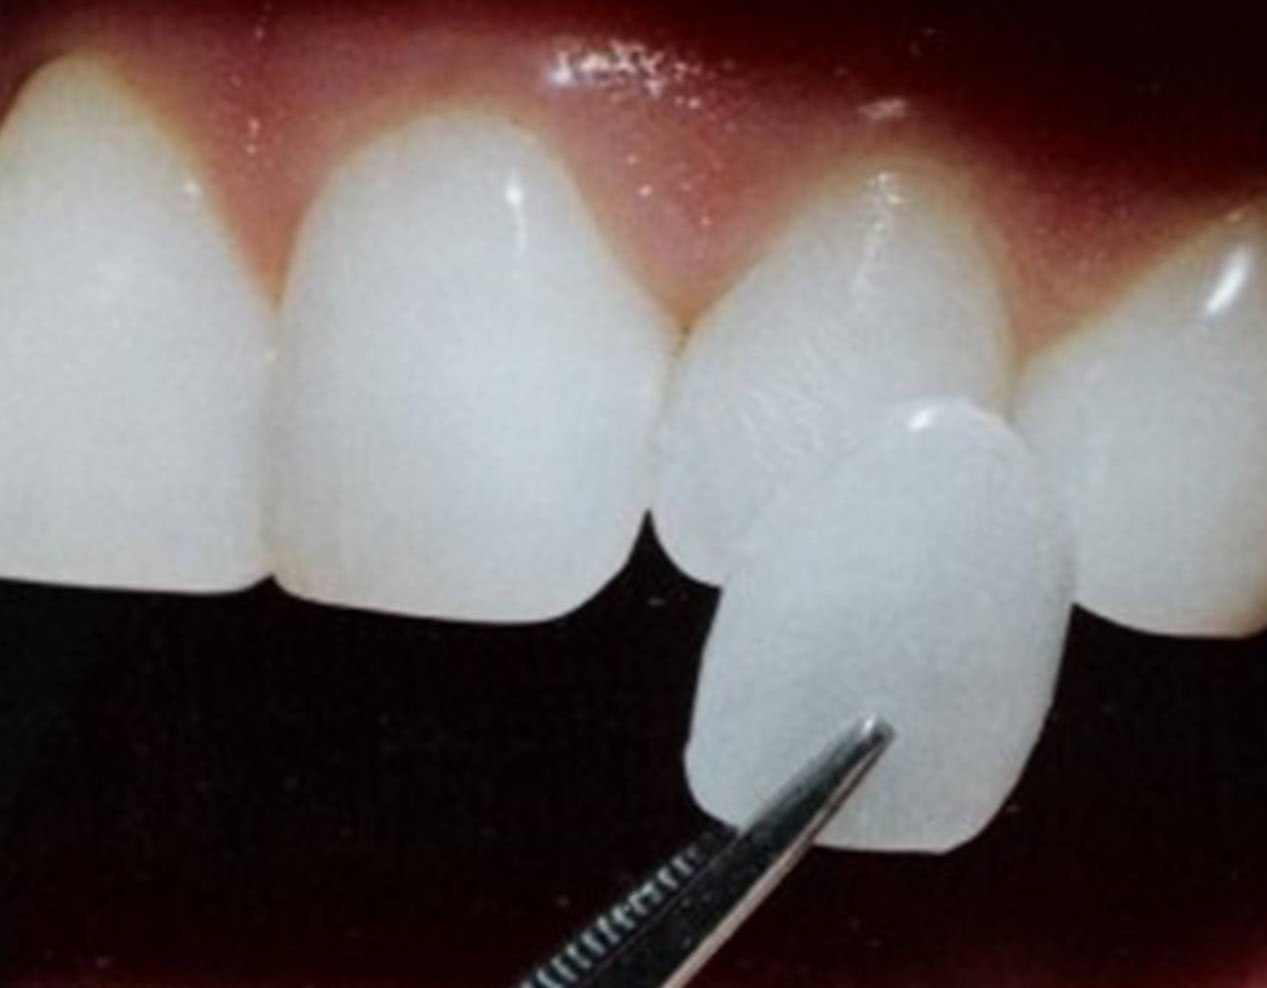 Răng sứ veneer giá bao nhiêu tiền?